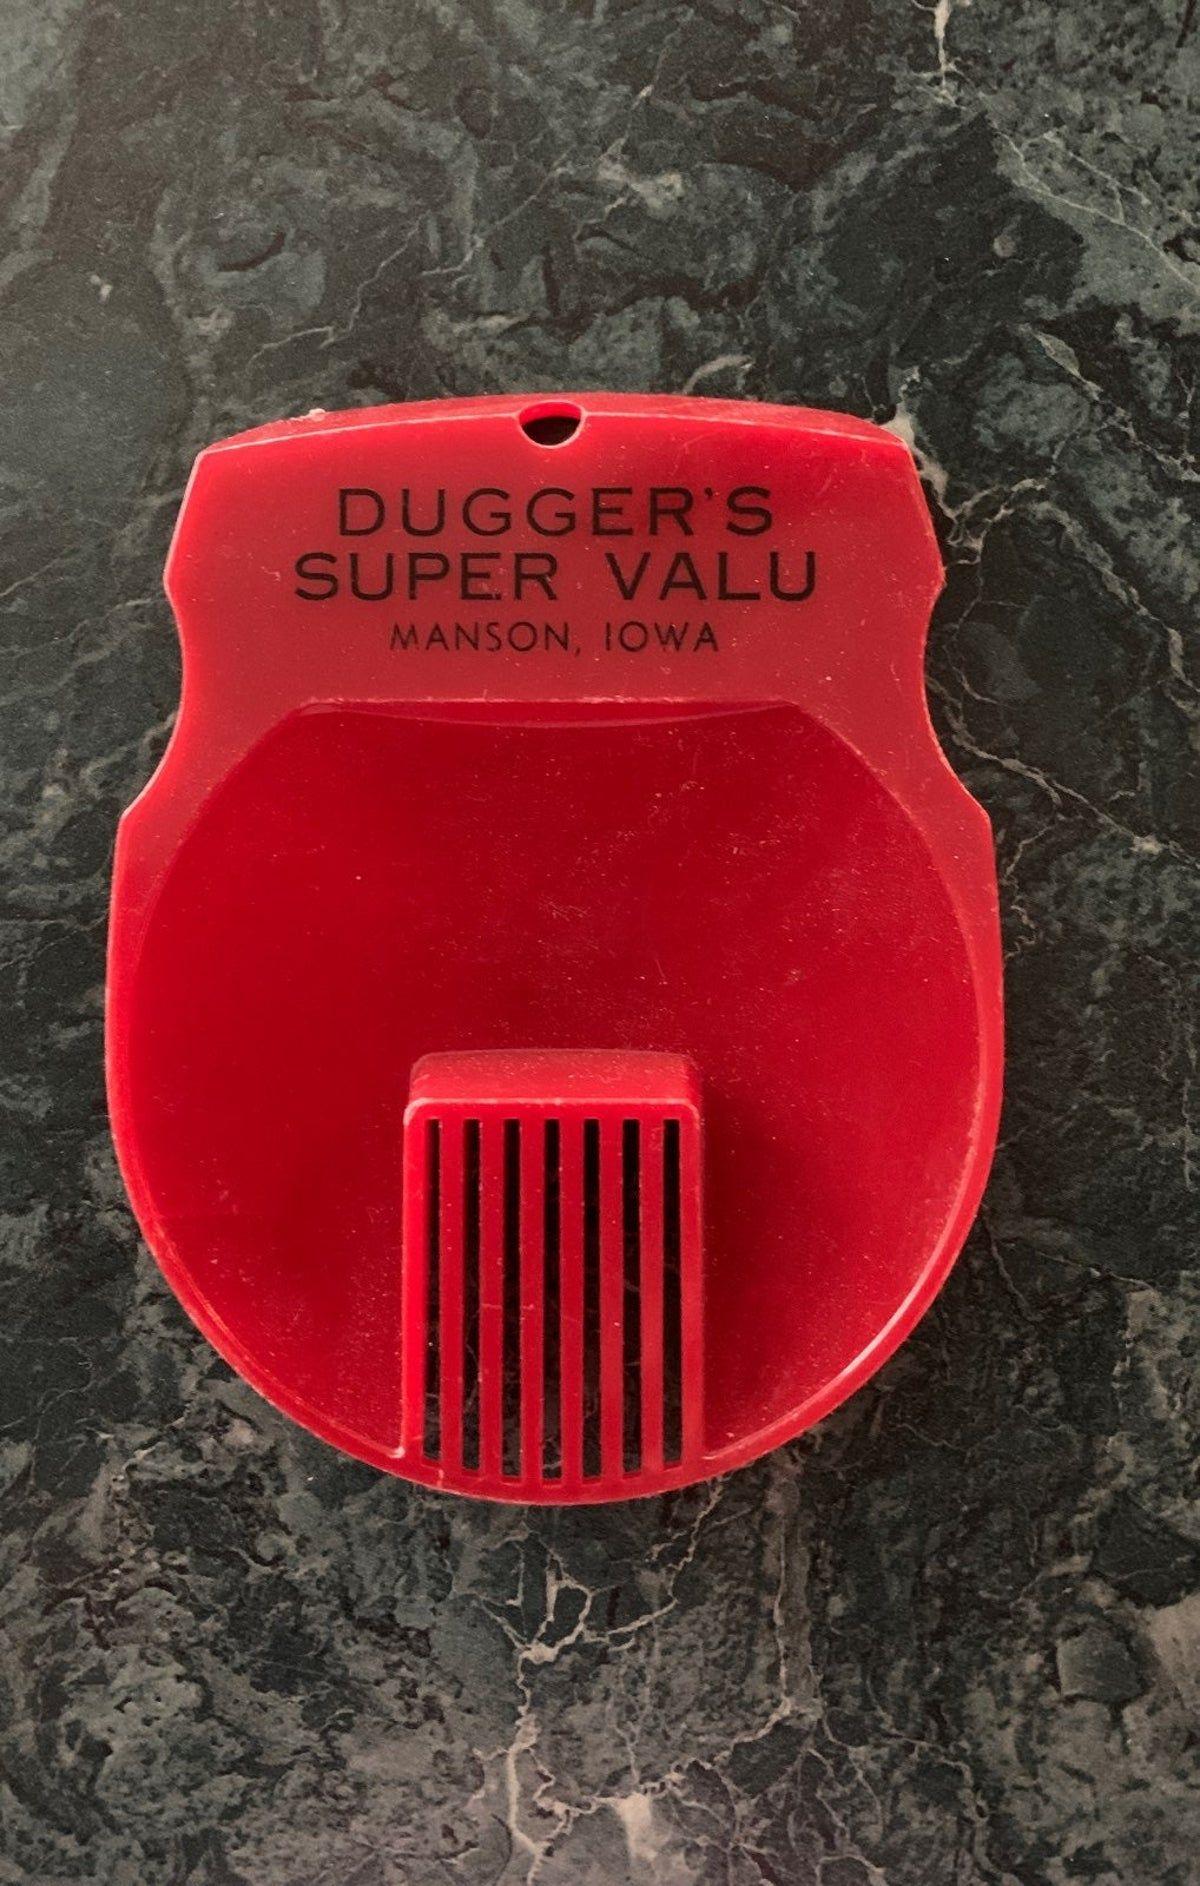 Vintage Strainer from DUGGER'S SUPER VAL on Mercar